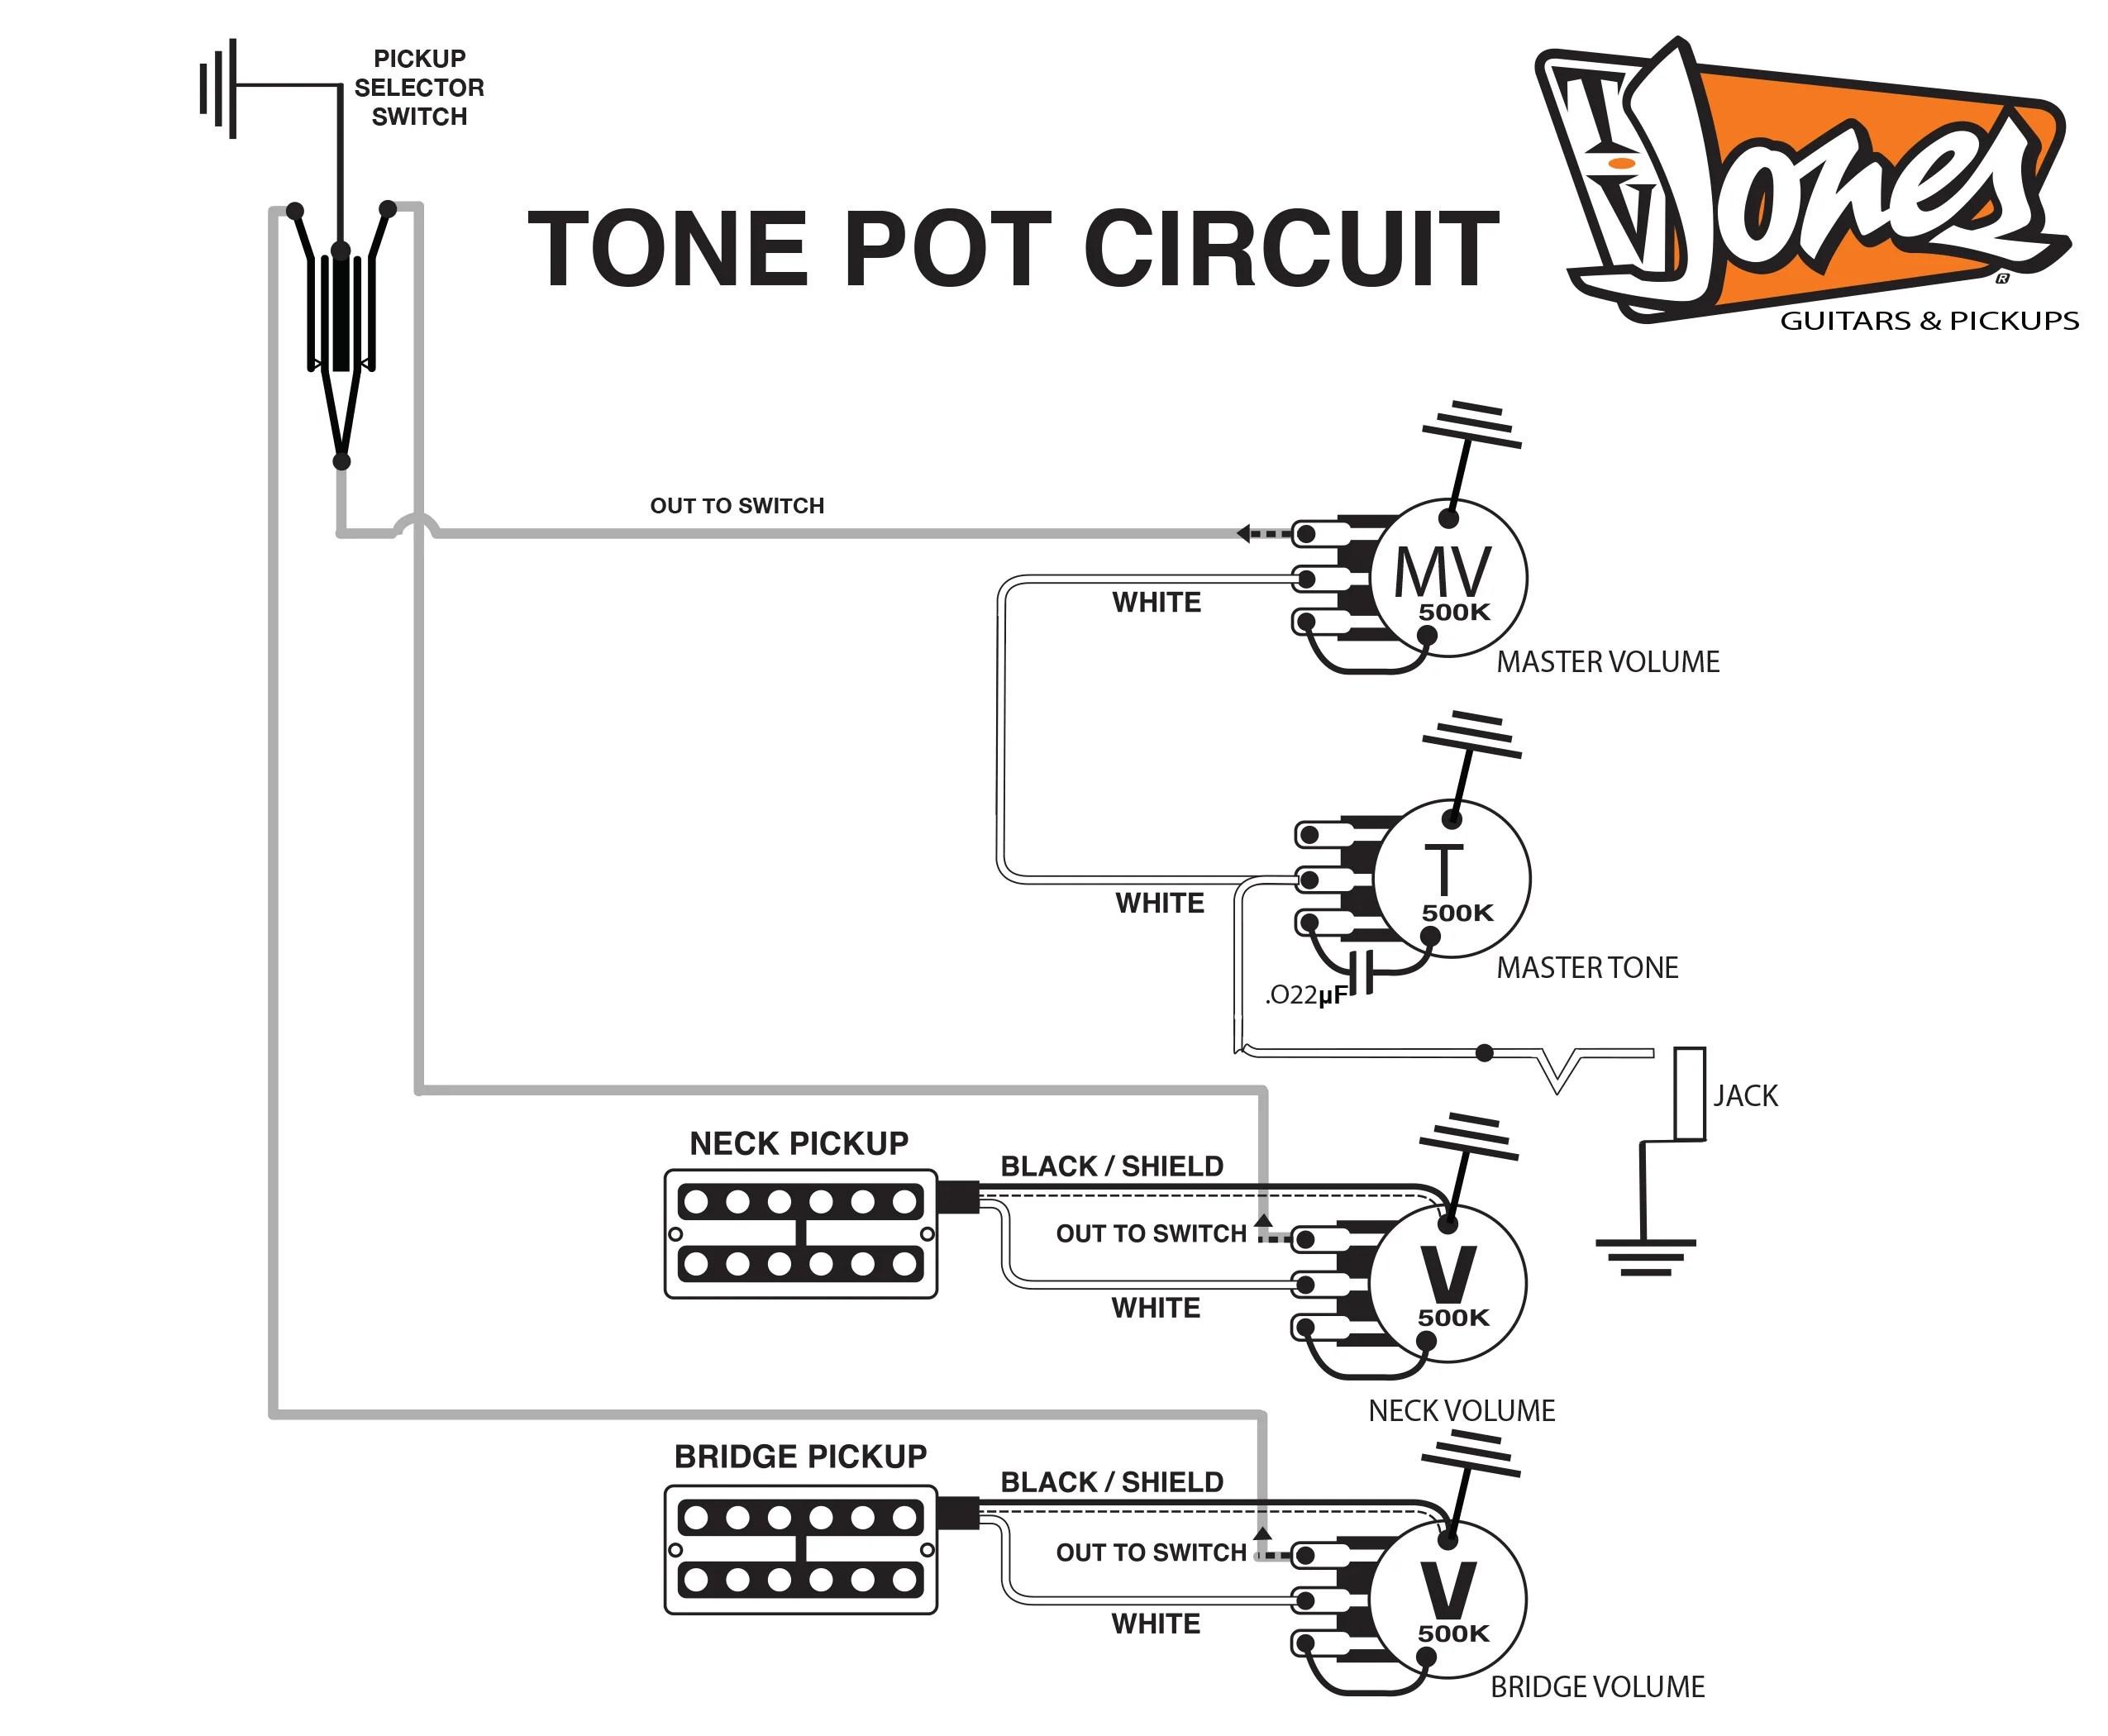 Gretsch Electric Guitar Wiring Diagram | Better Wiring